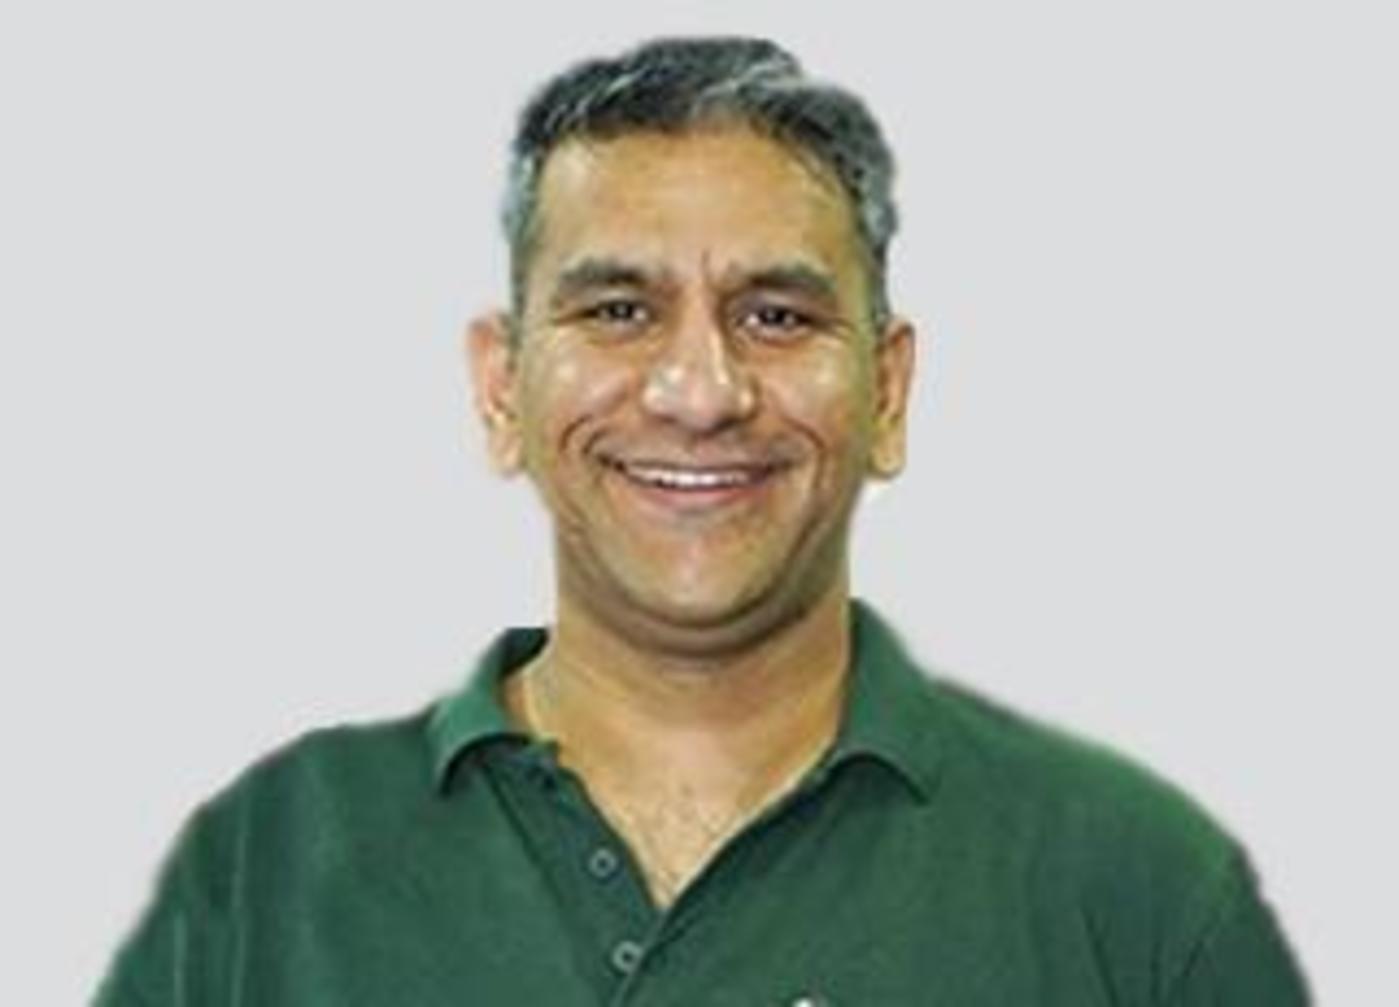 Jumbotail联合创始人及COO Ashish Jhina